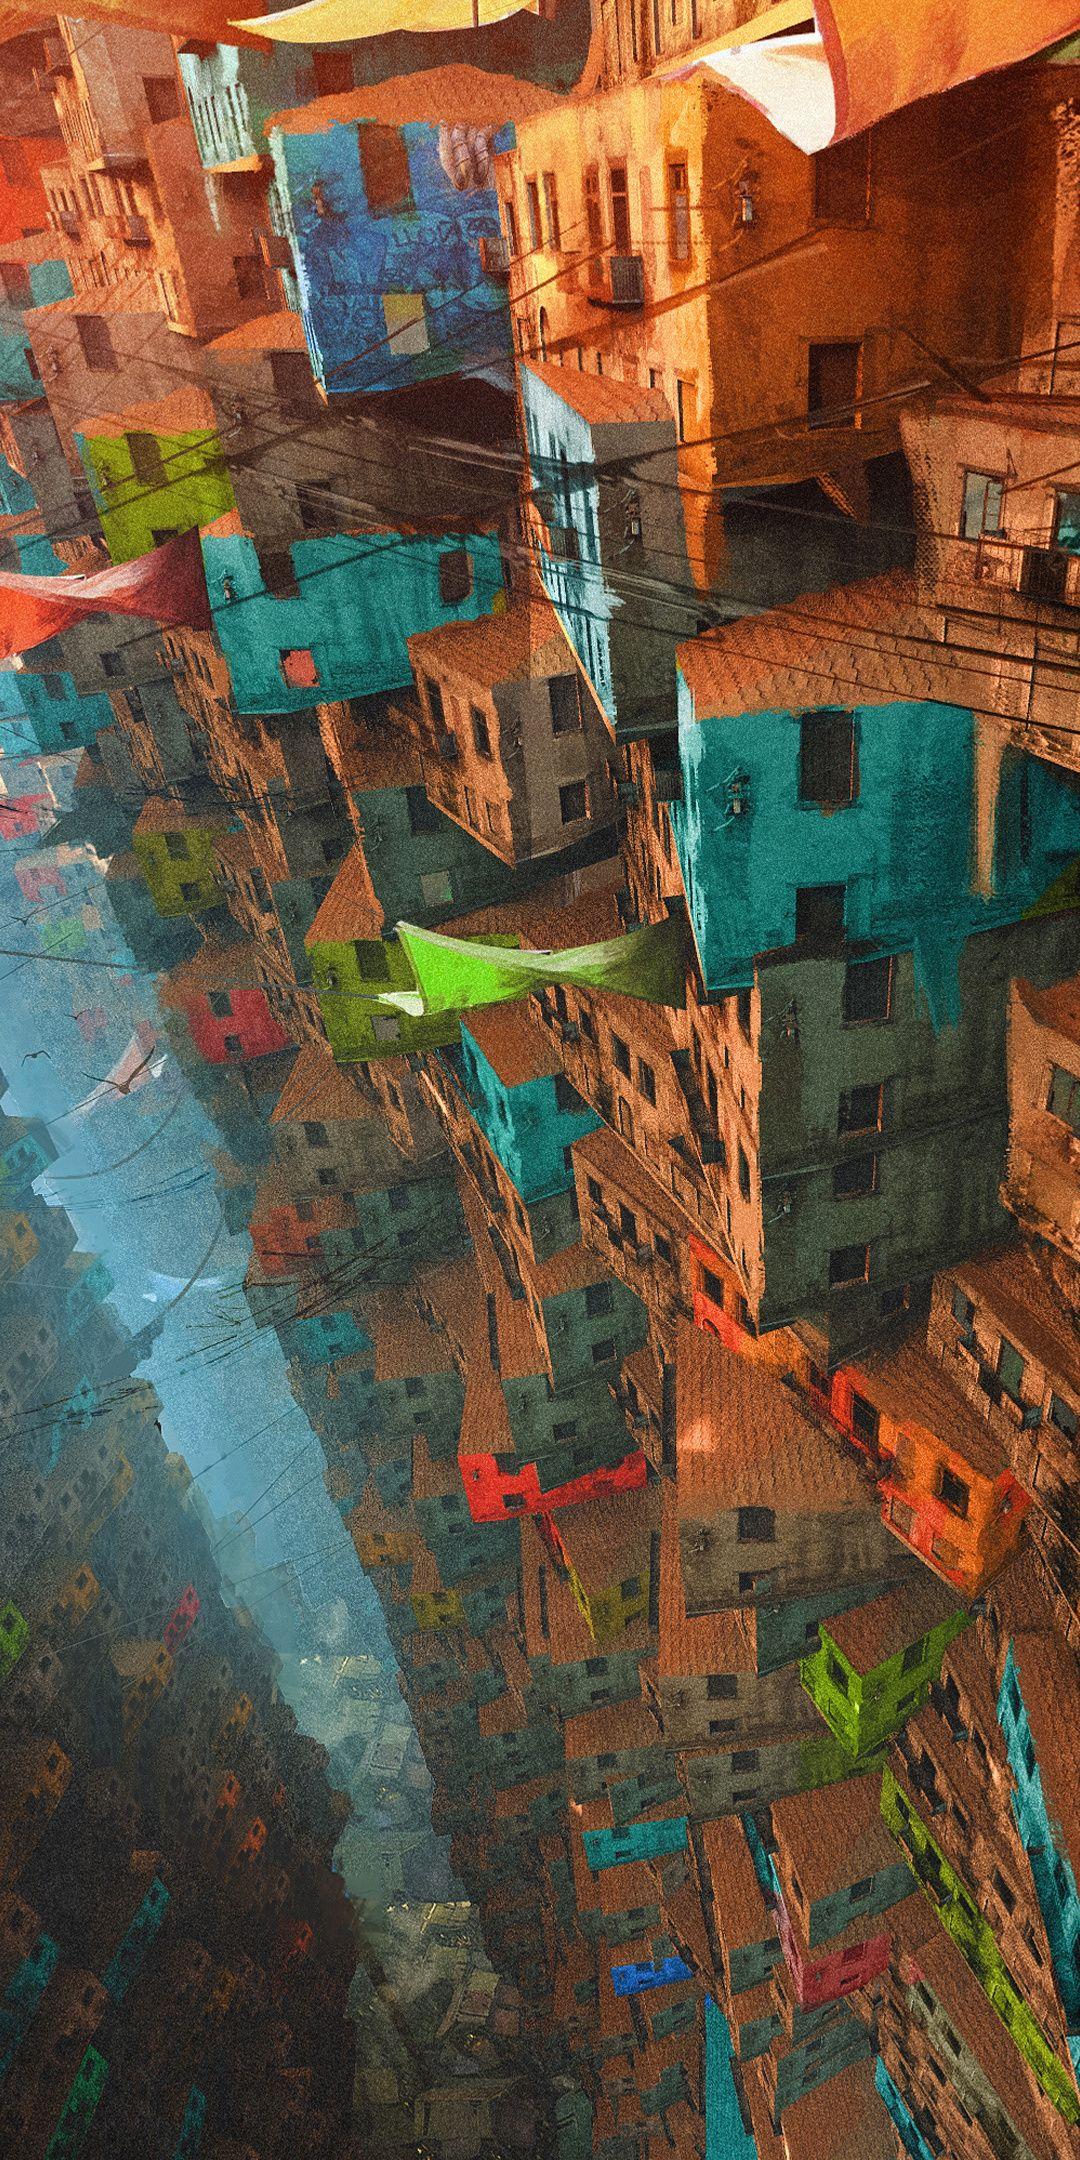 Cityscape, buildings, apartments, colorful, art, 1080x2160 wallpaper